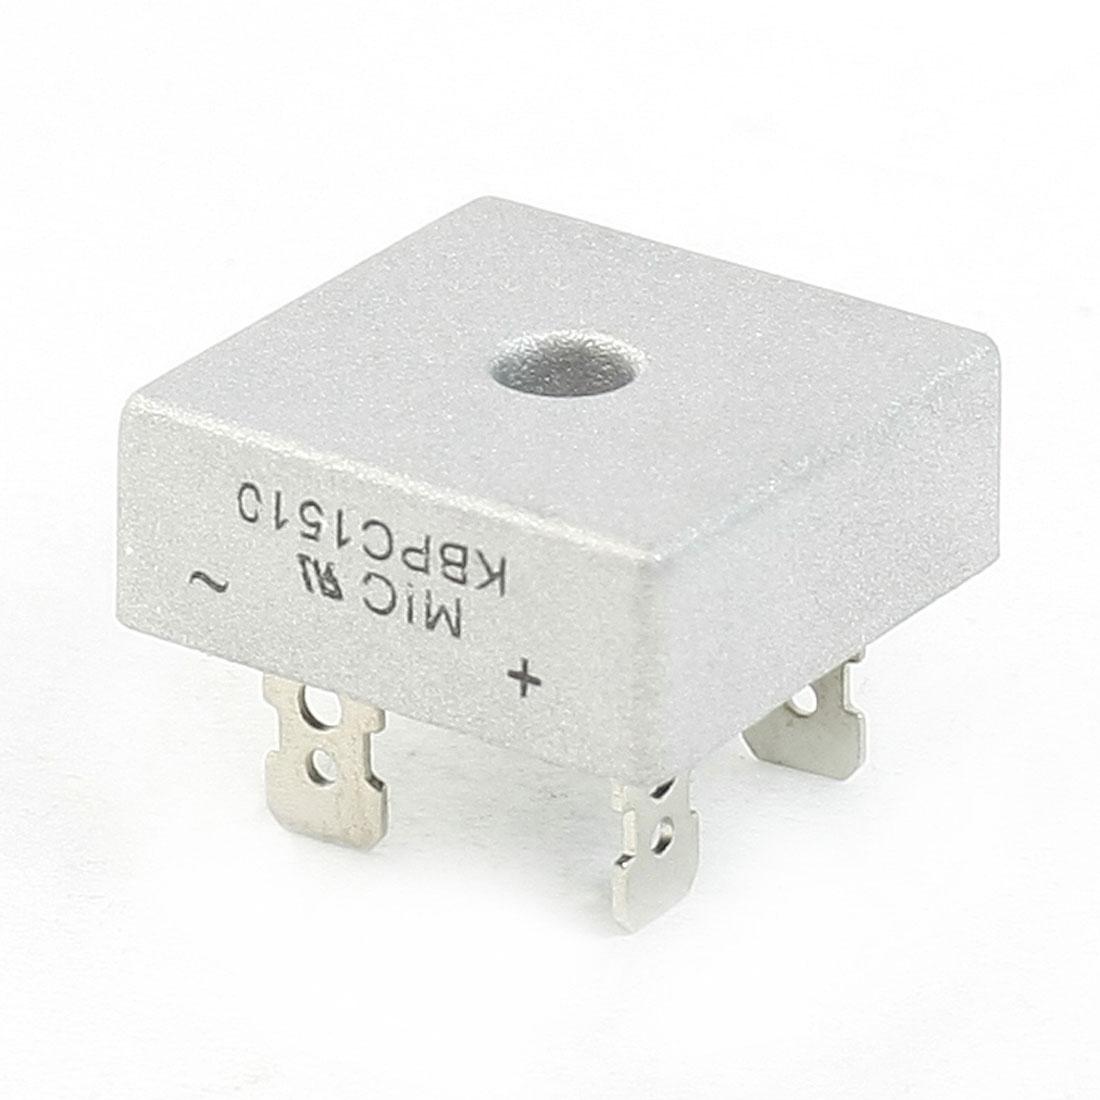 KBPC15-10 1KV 15Amp Silver Tone Metal Case Single Phase Bridge Rectifier